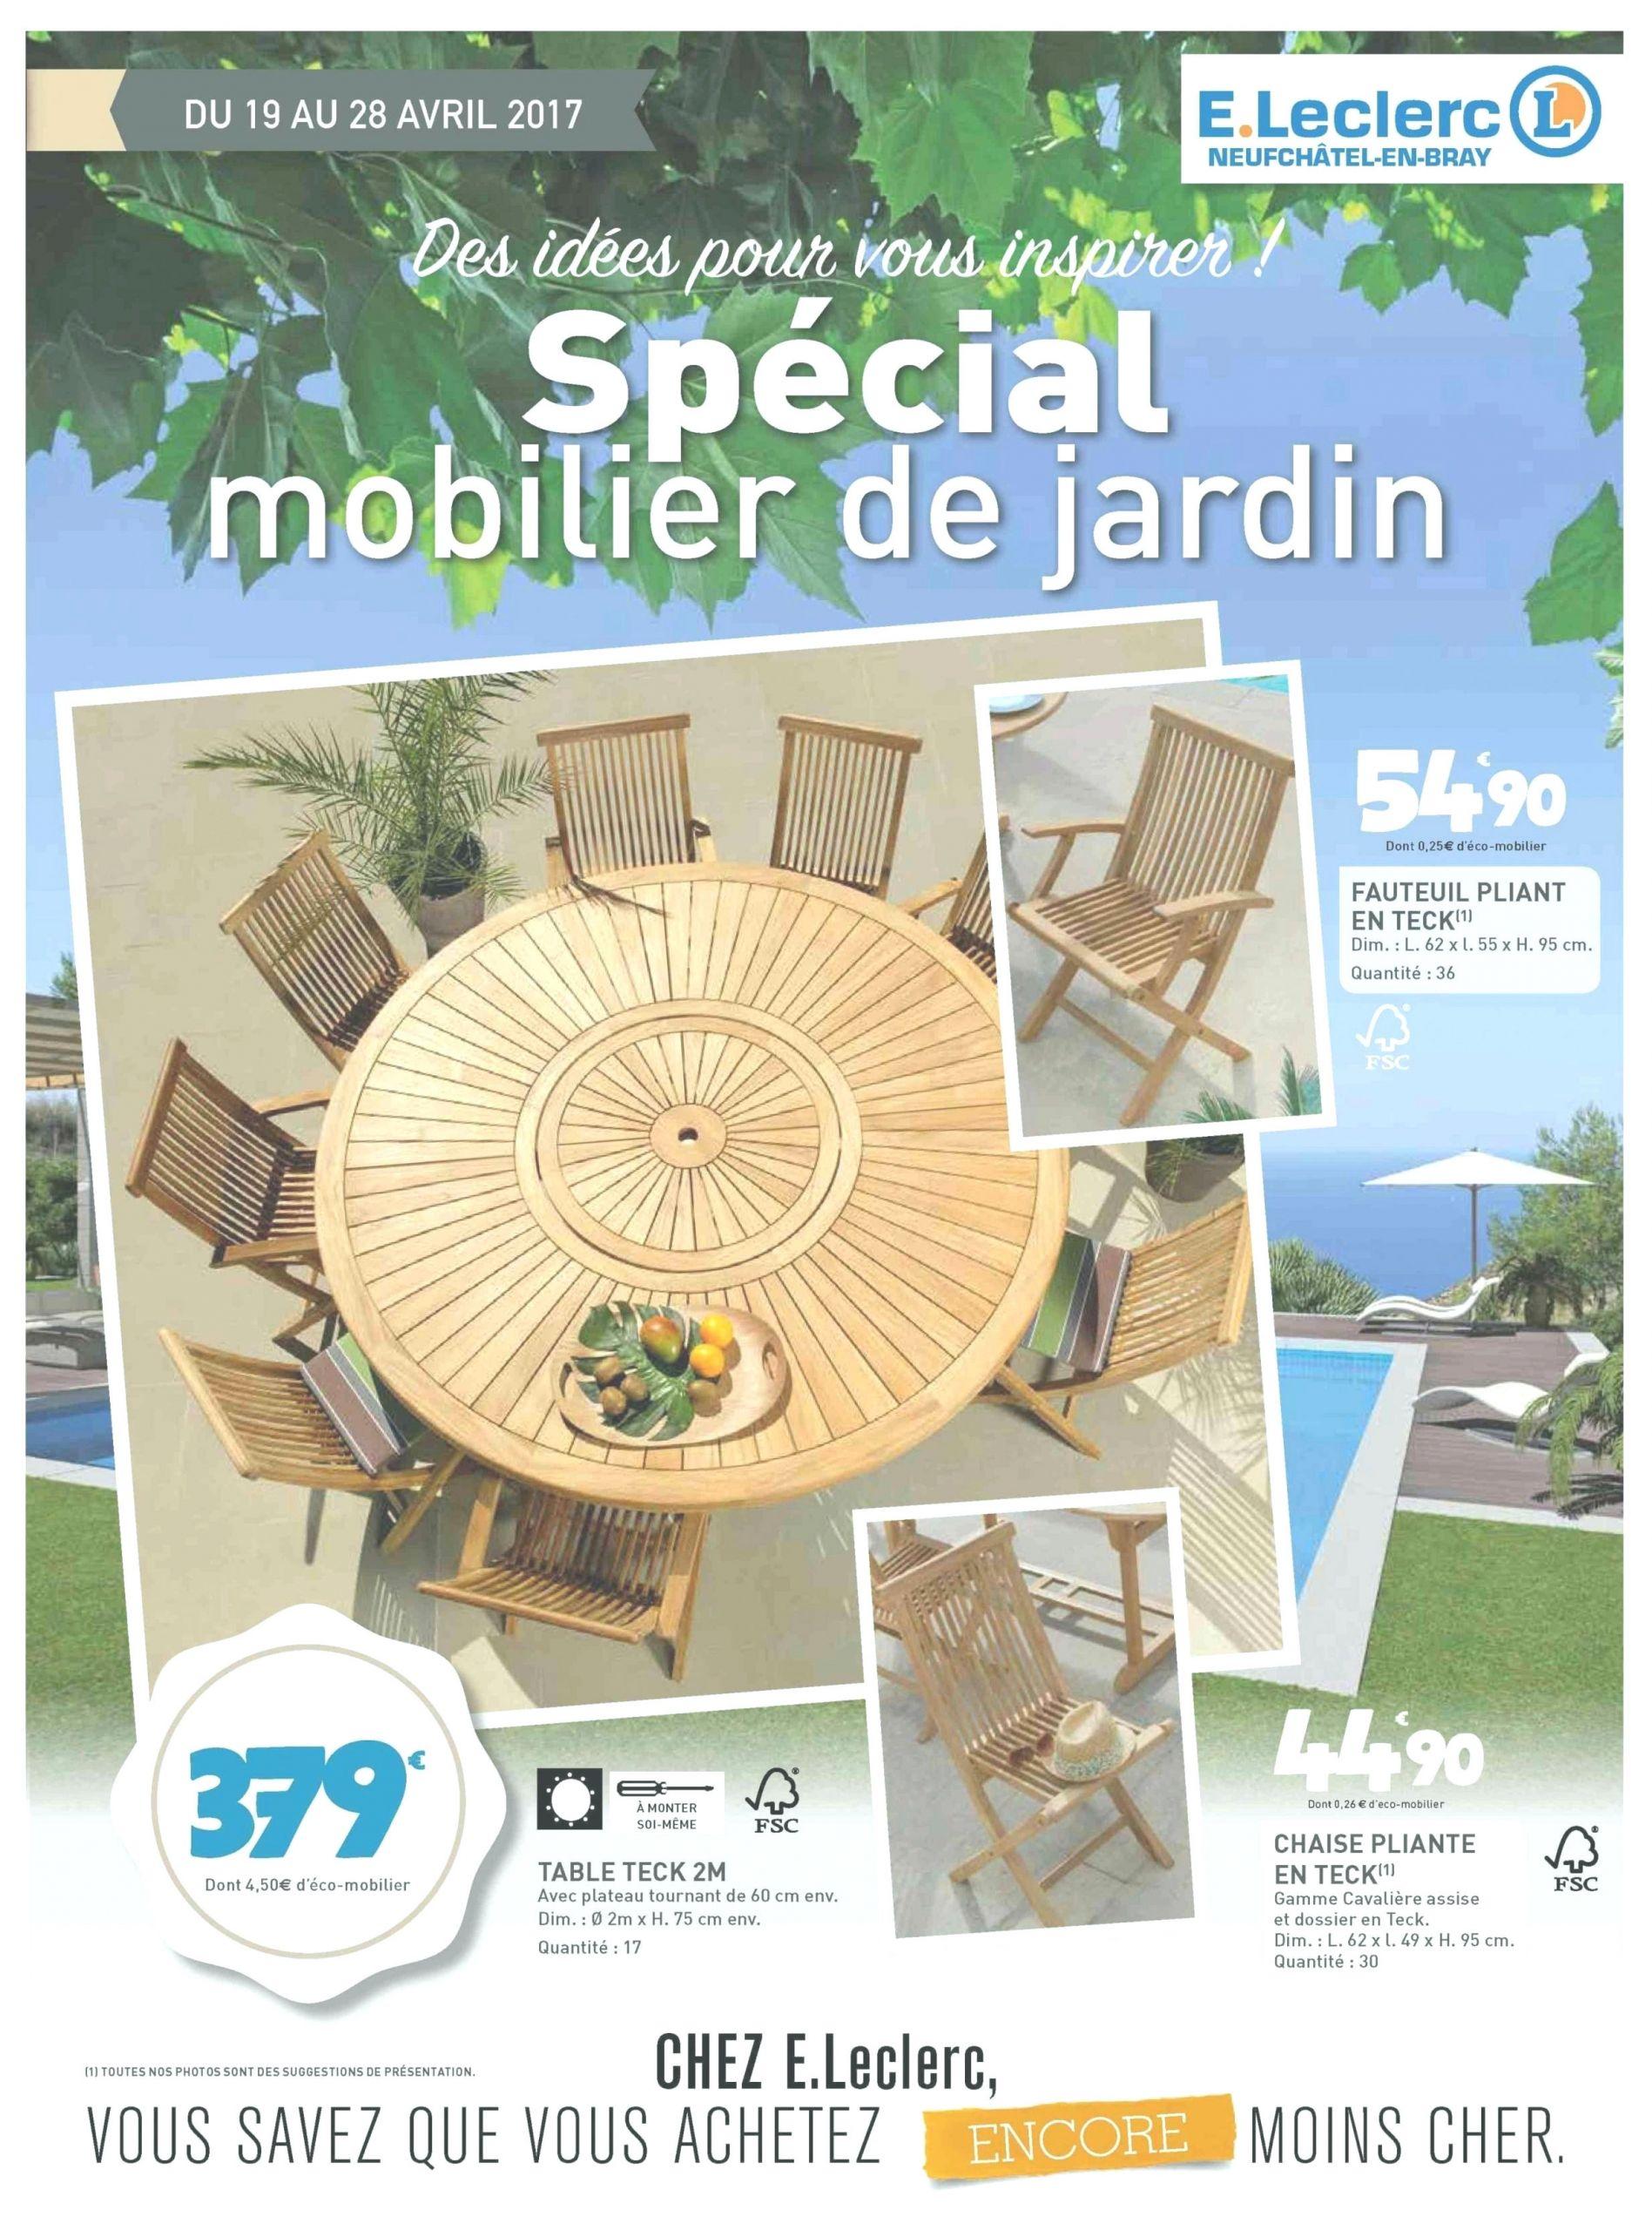 magasin meuble auxerre 29 concept brico depot meuble of magasin meuble auxerre